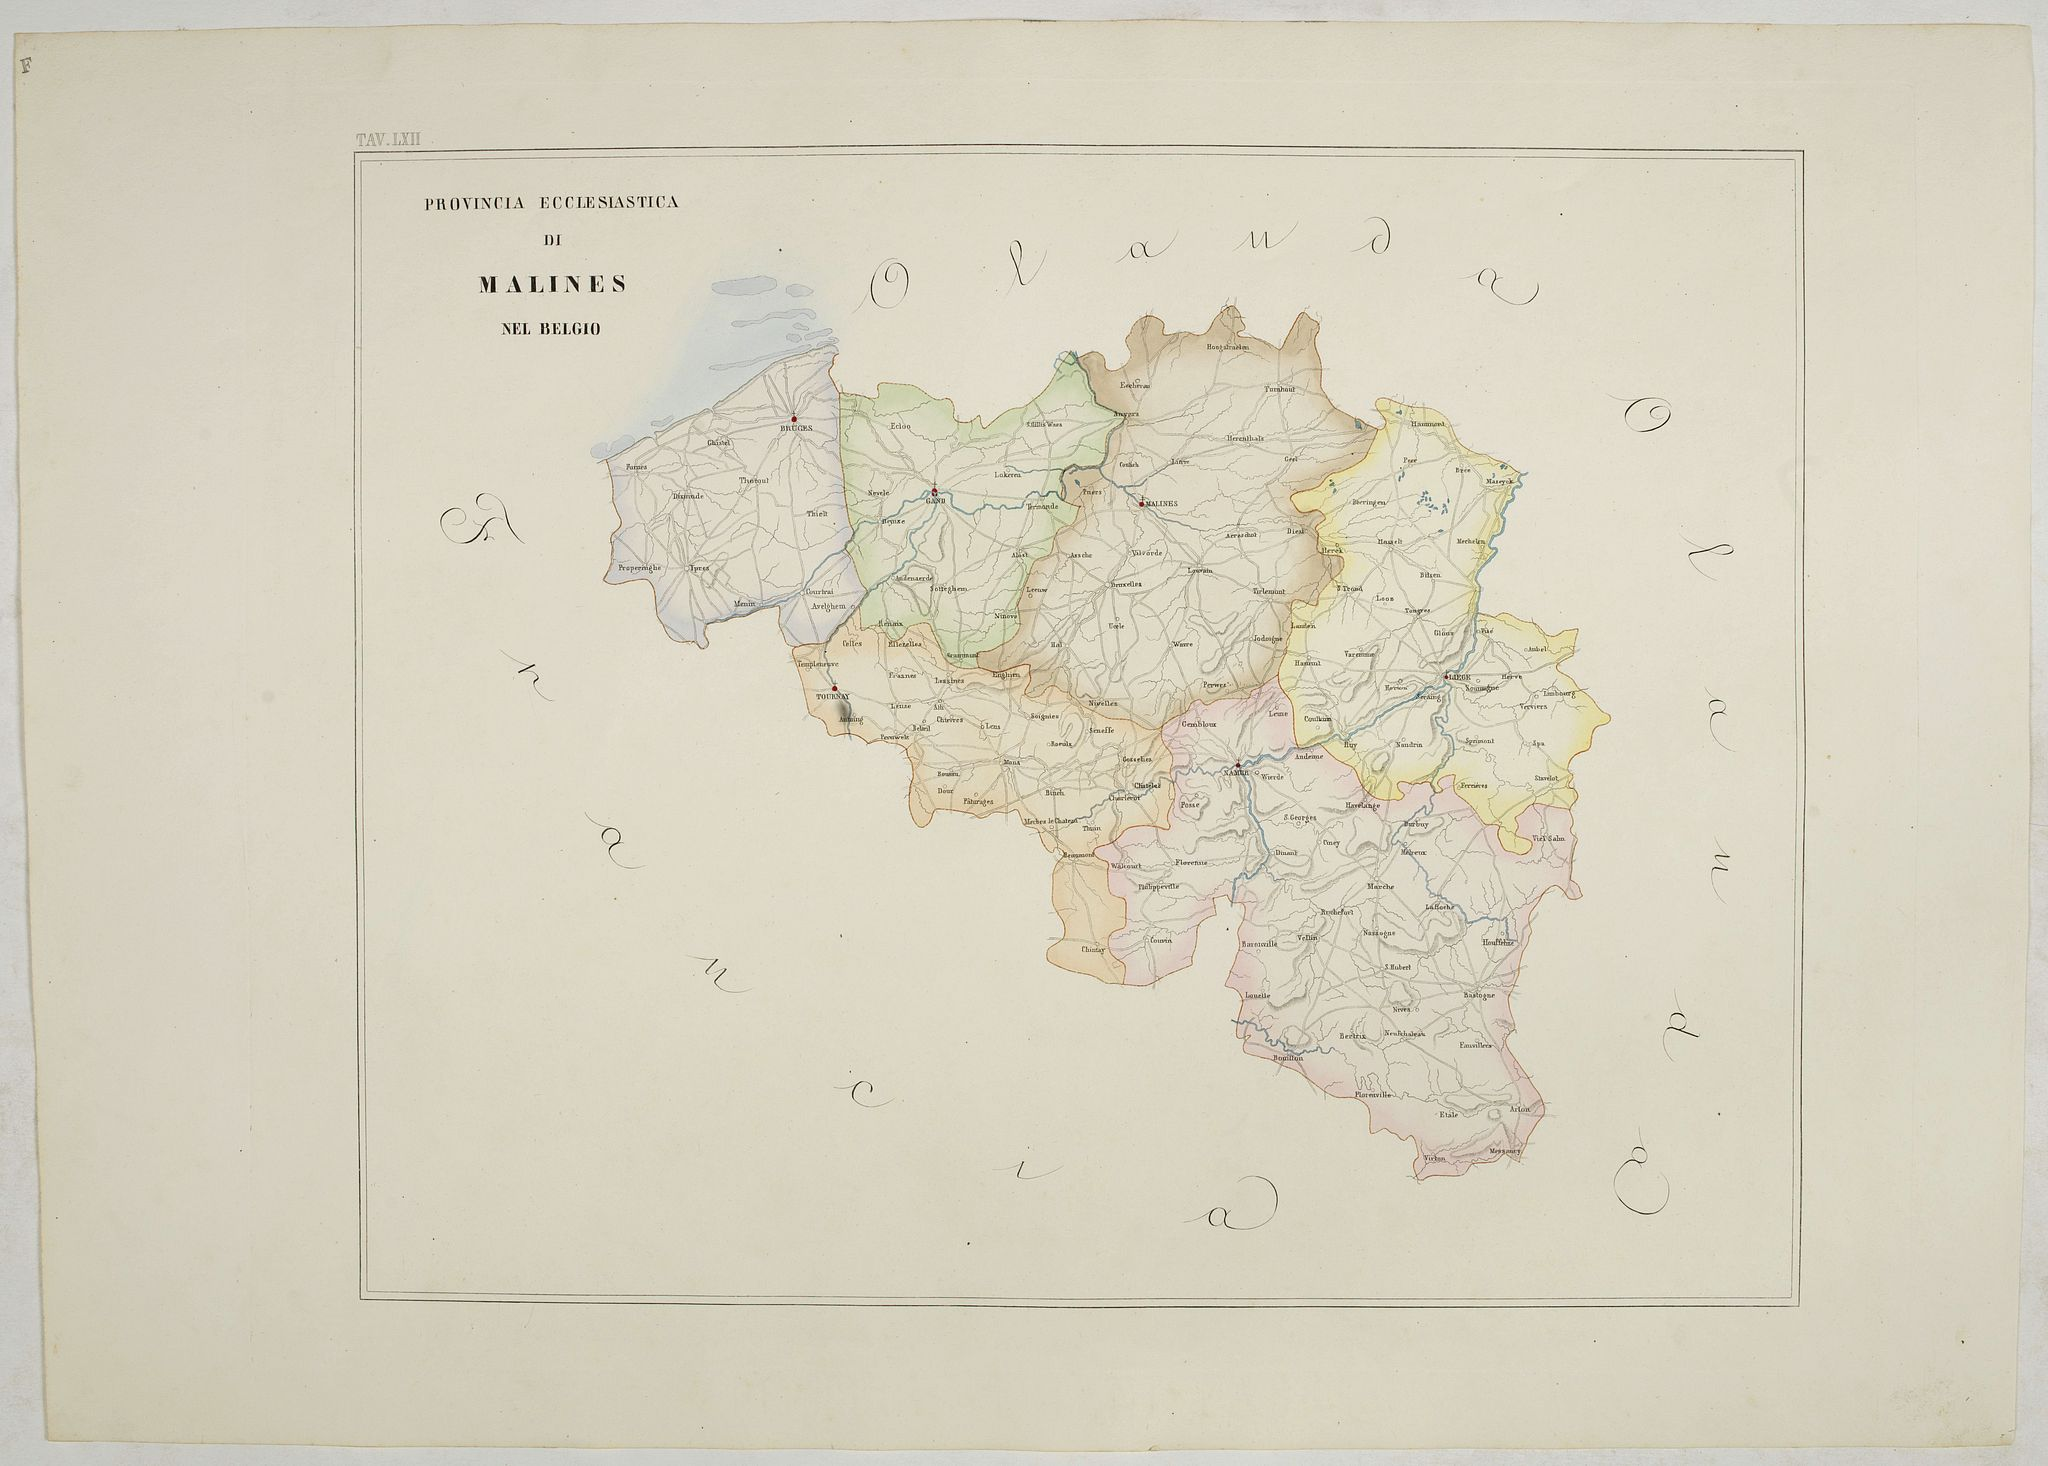 PETRI  Girolamo -  Provincia ecclesiastica di Malines nel Belgio (Tav LXII)